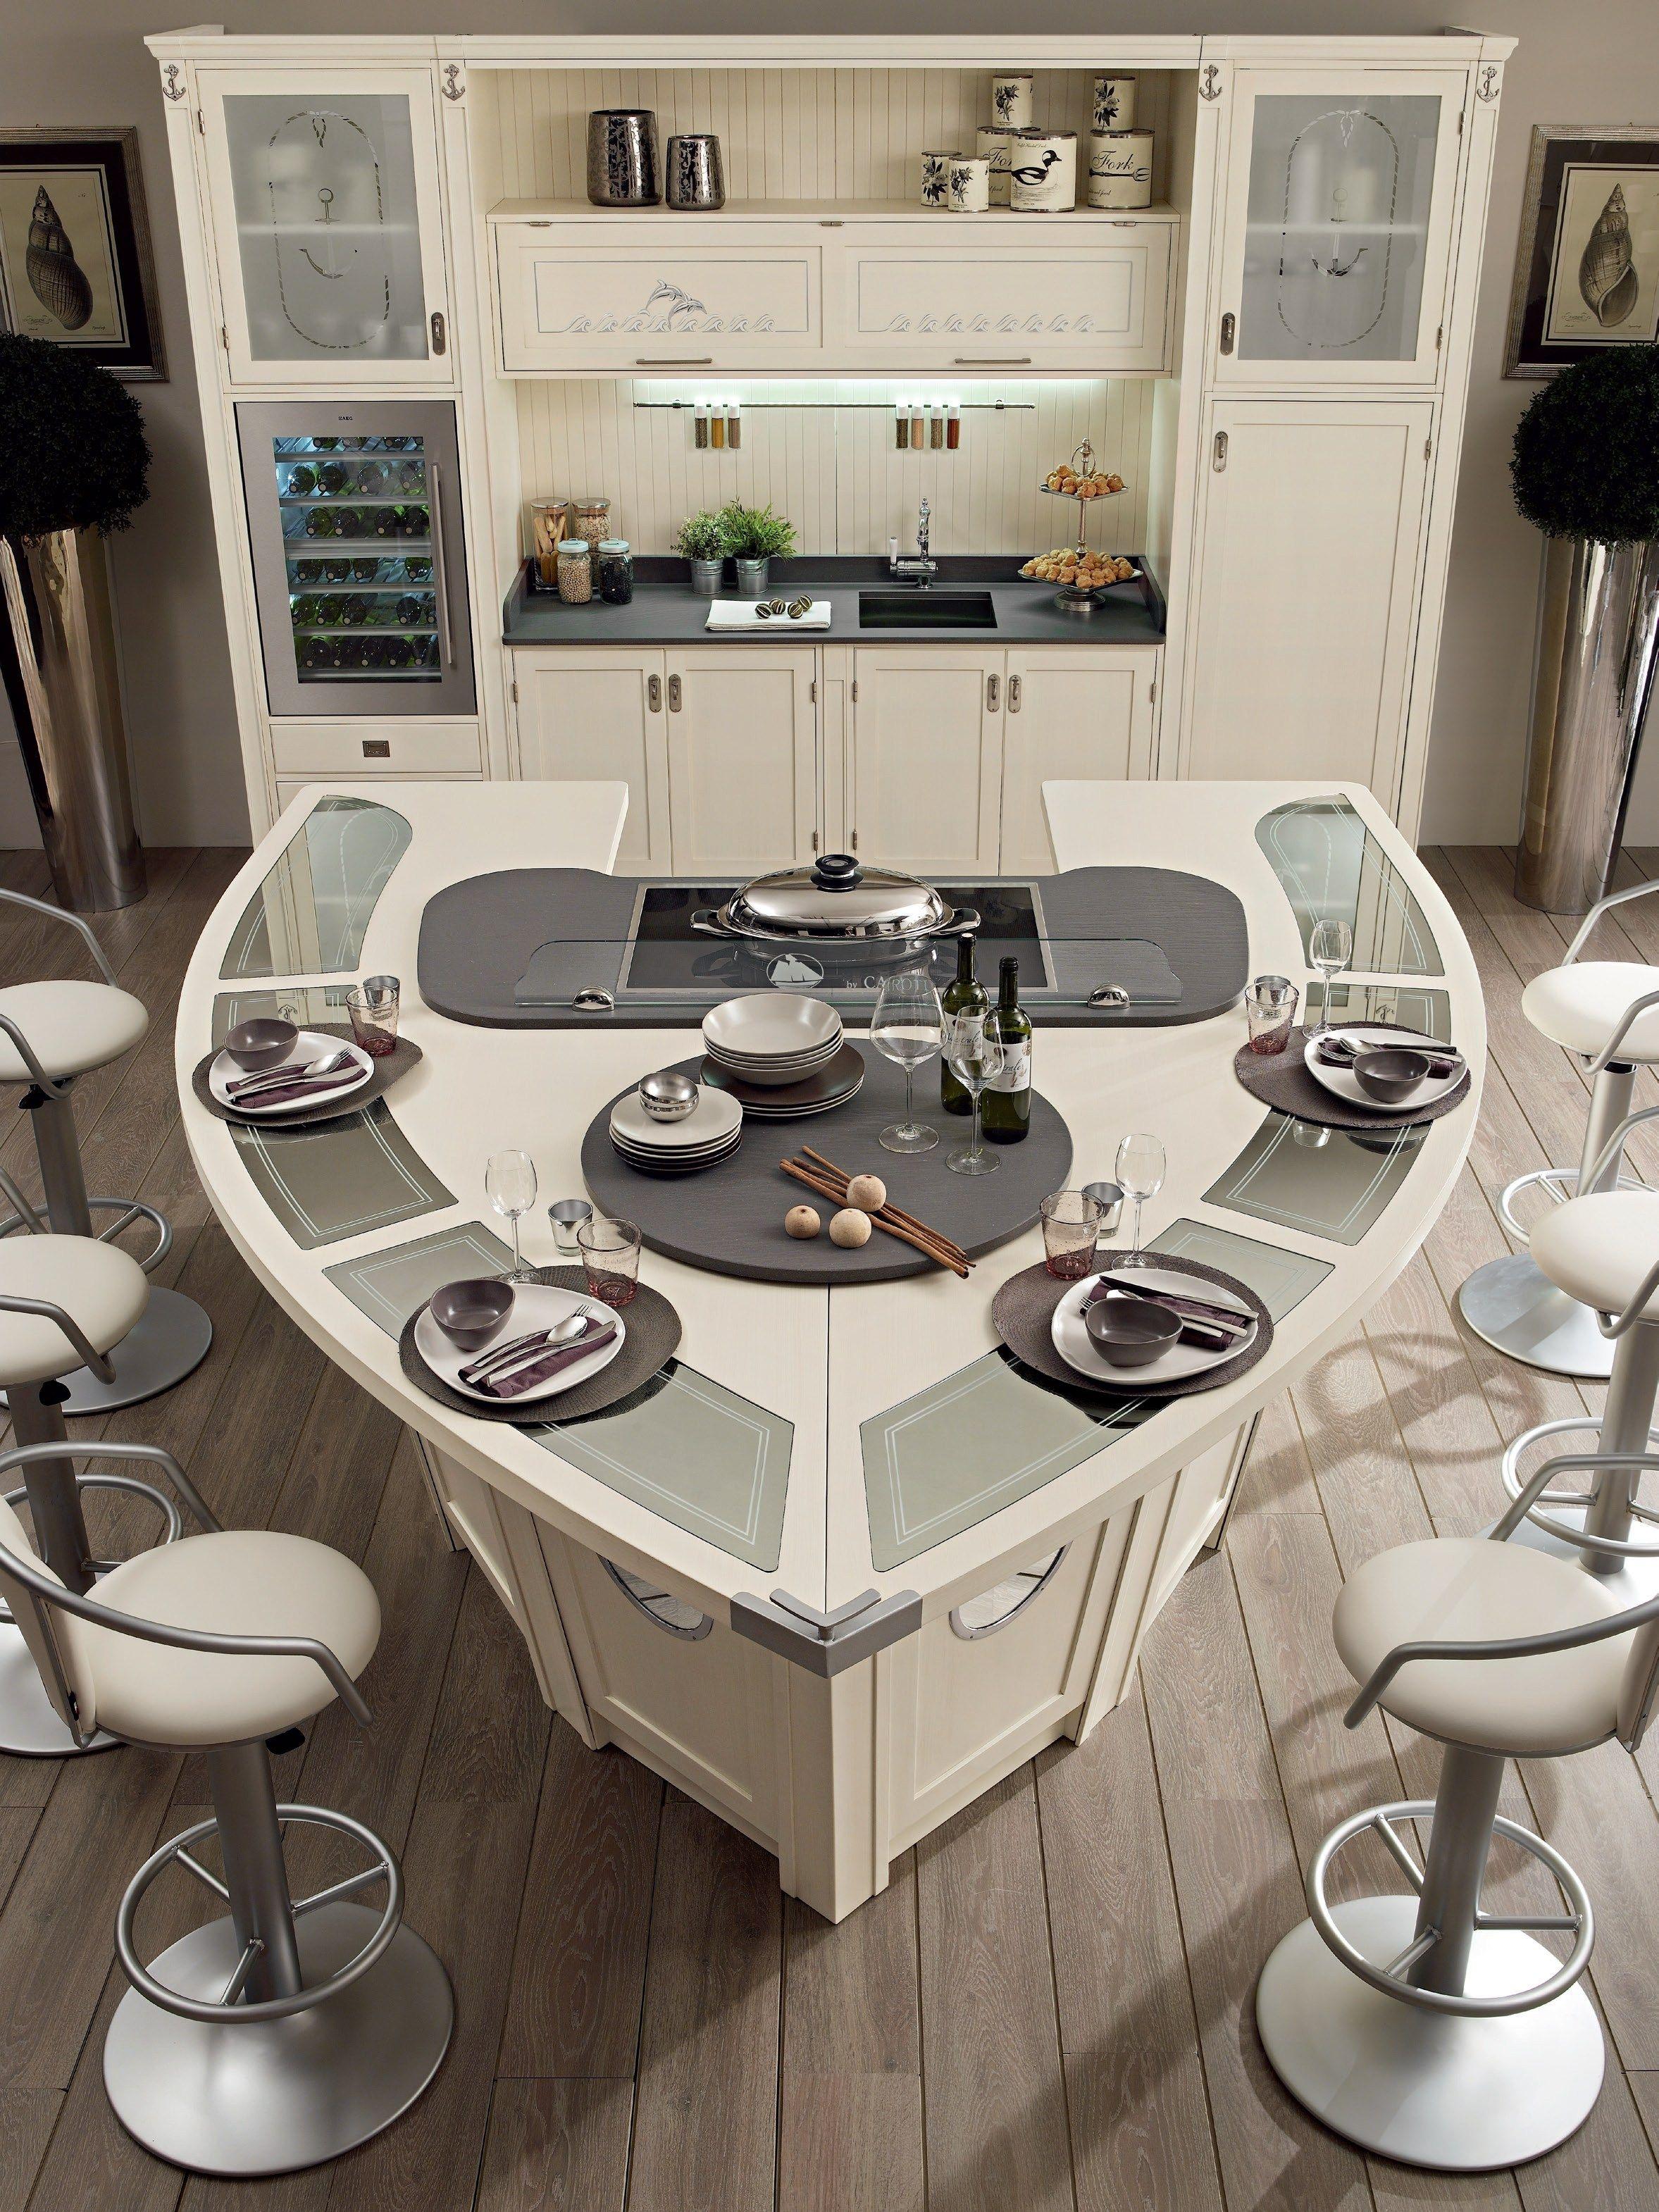 Emejing Cucina Con L Isola Gallery - Ideas & Design 2017 ...